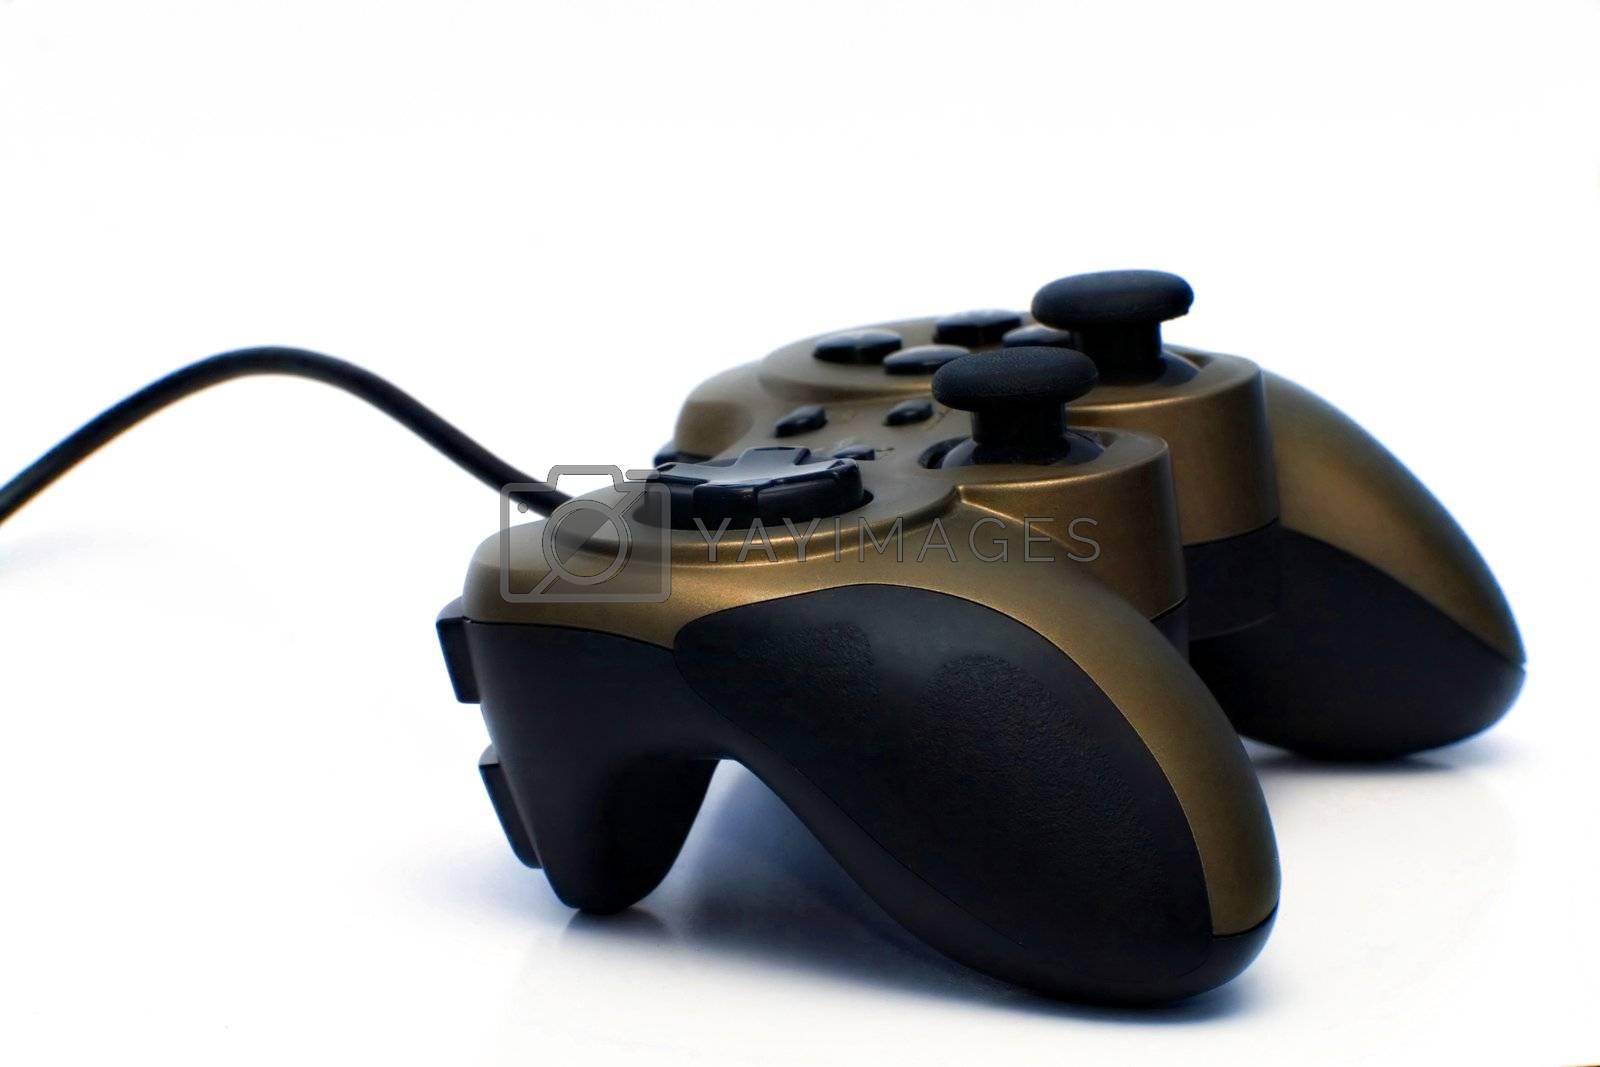 Gamepad on white background